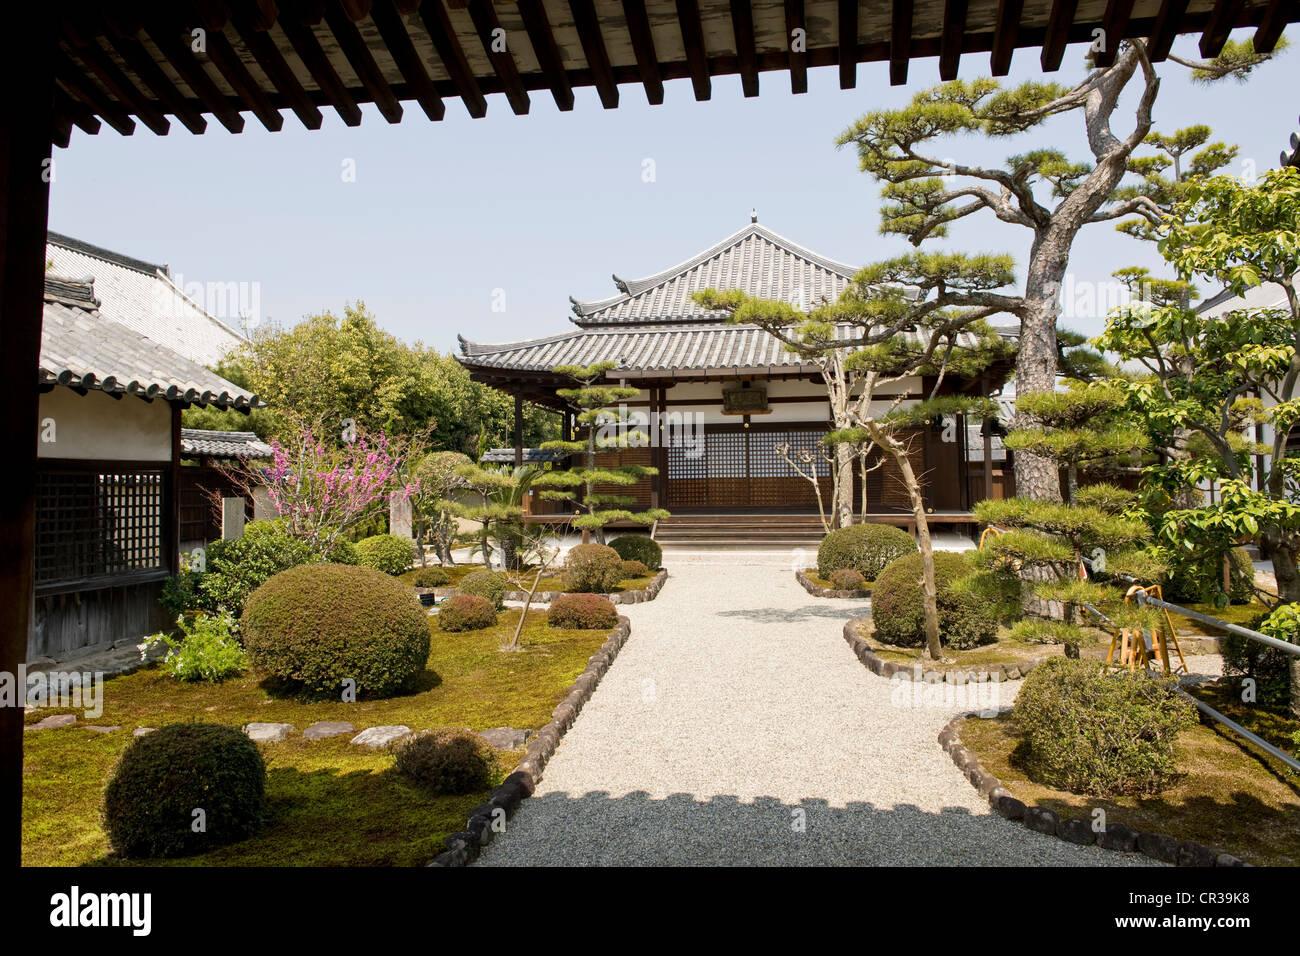 Japan, Honshu Island, Kinki Region, city of Nara - Stock Image